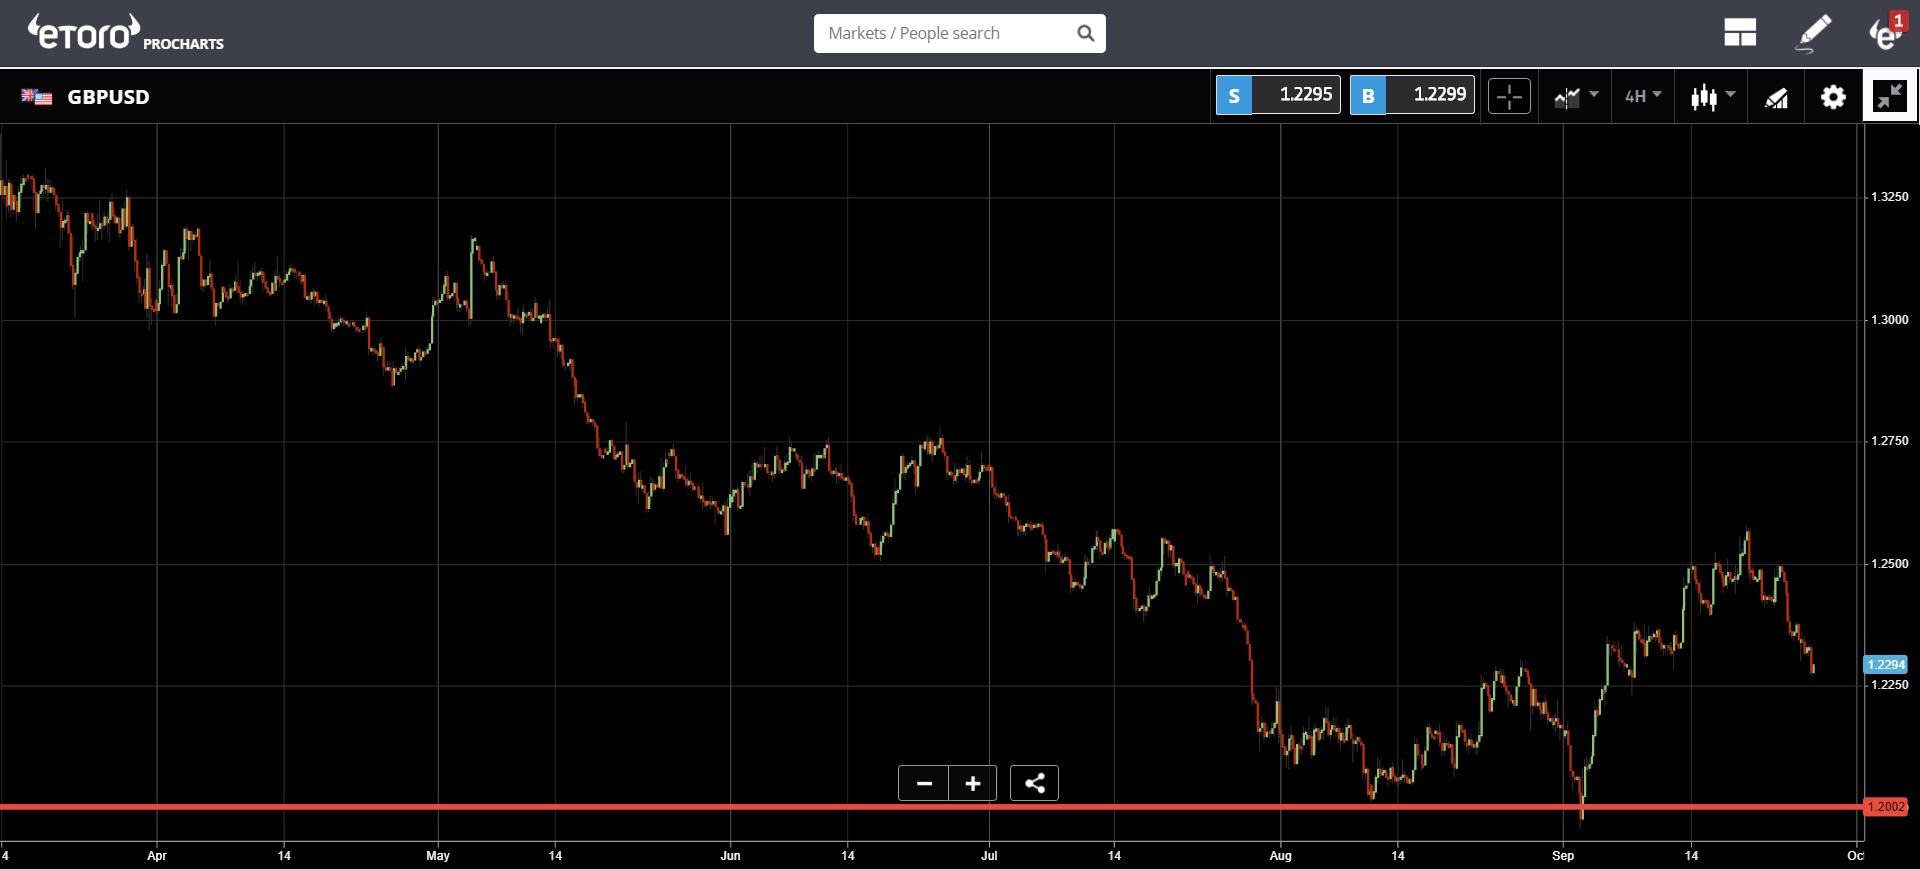 market, trading, bitcoin, blockchain, ethereum, trading